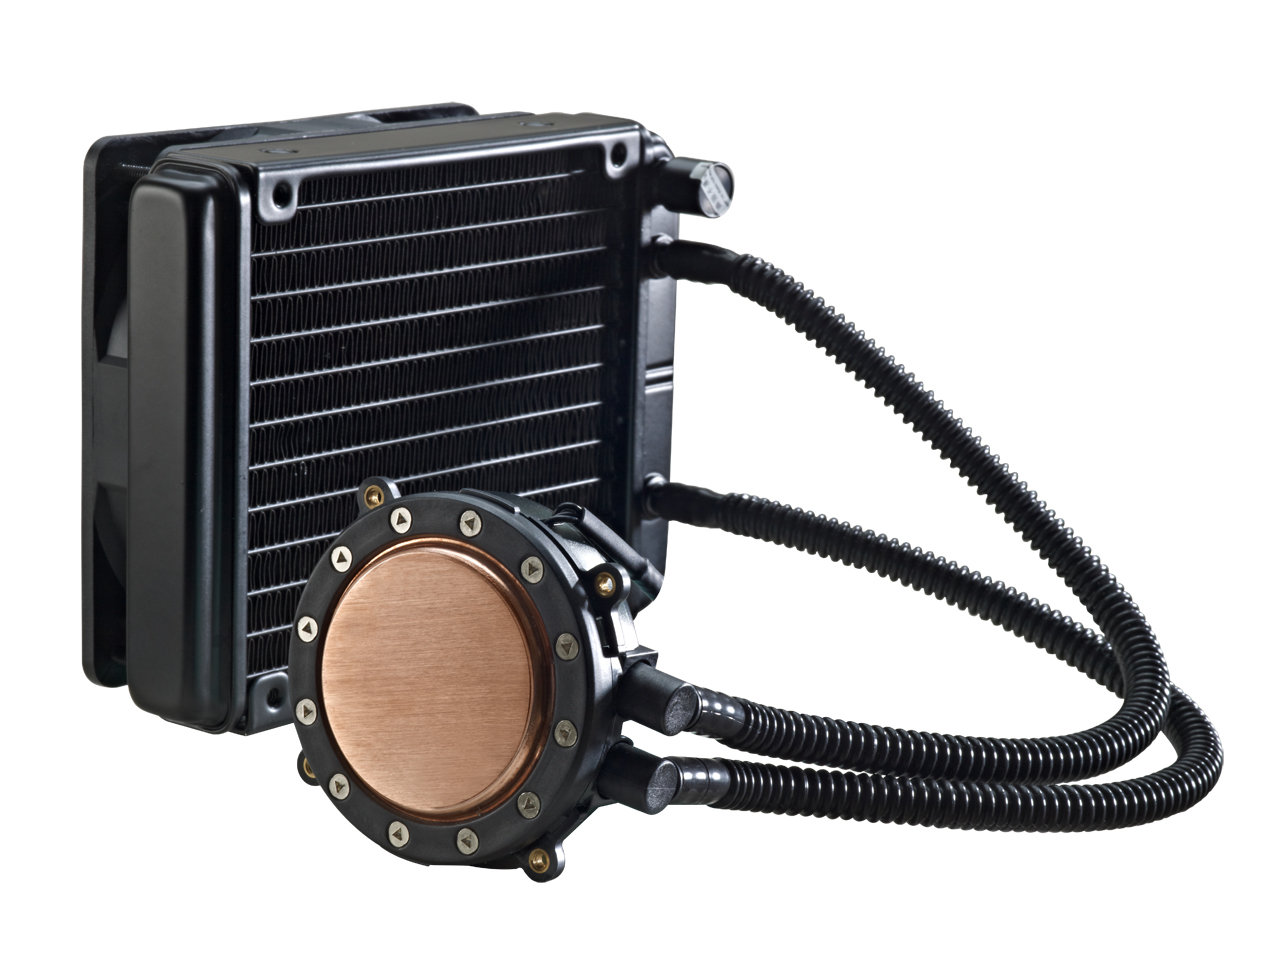 Coolermaster Seidon 120M Kühlfläche